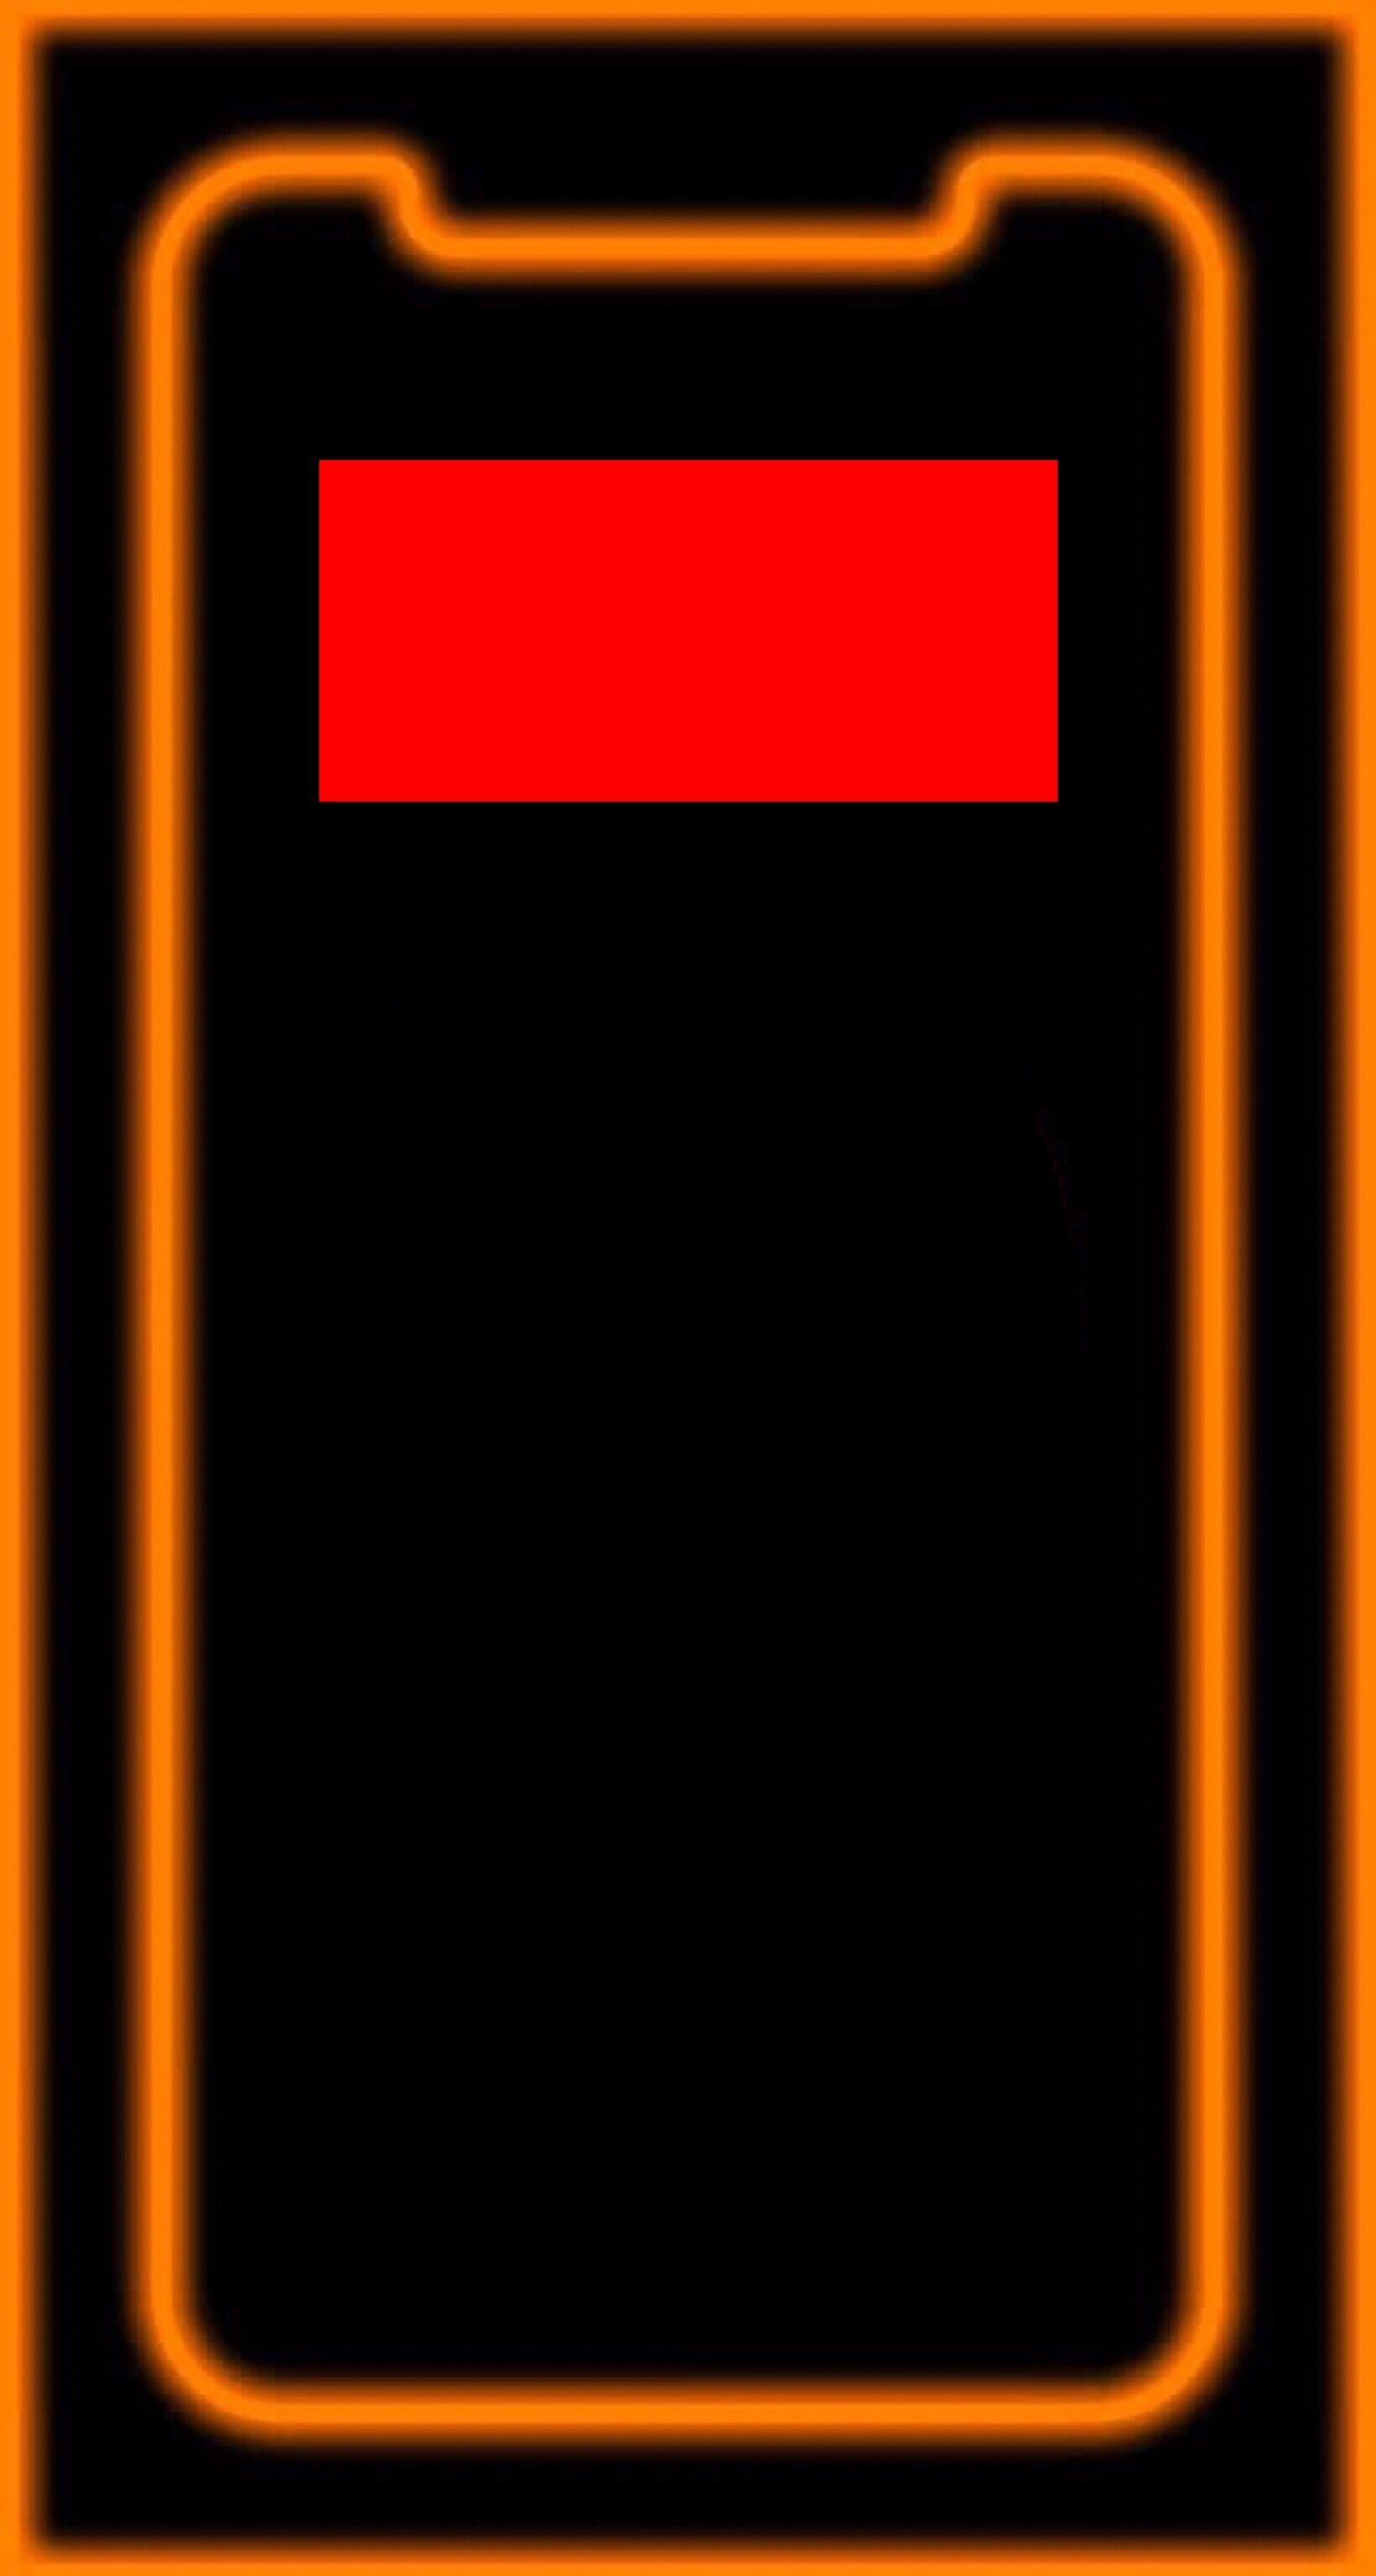 Wallpaper Iphone X Red Lock Screen Template Iphone X Wallpaper